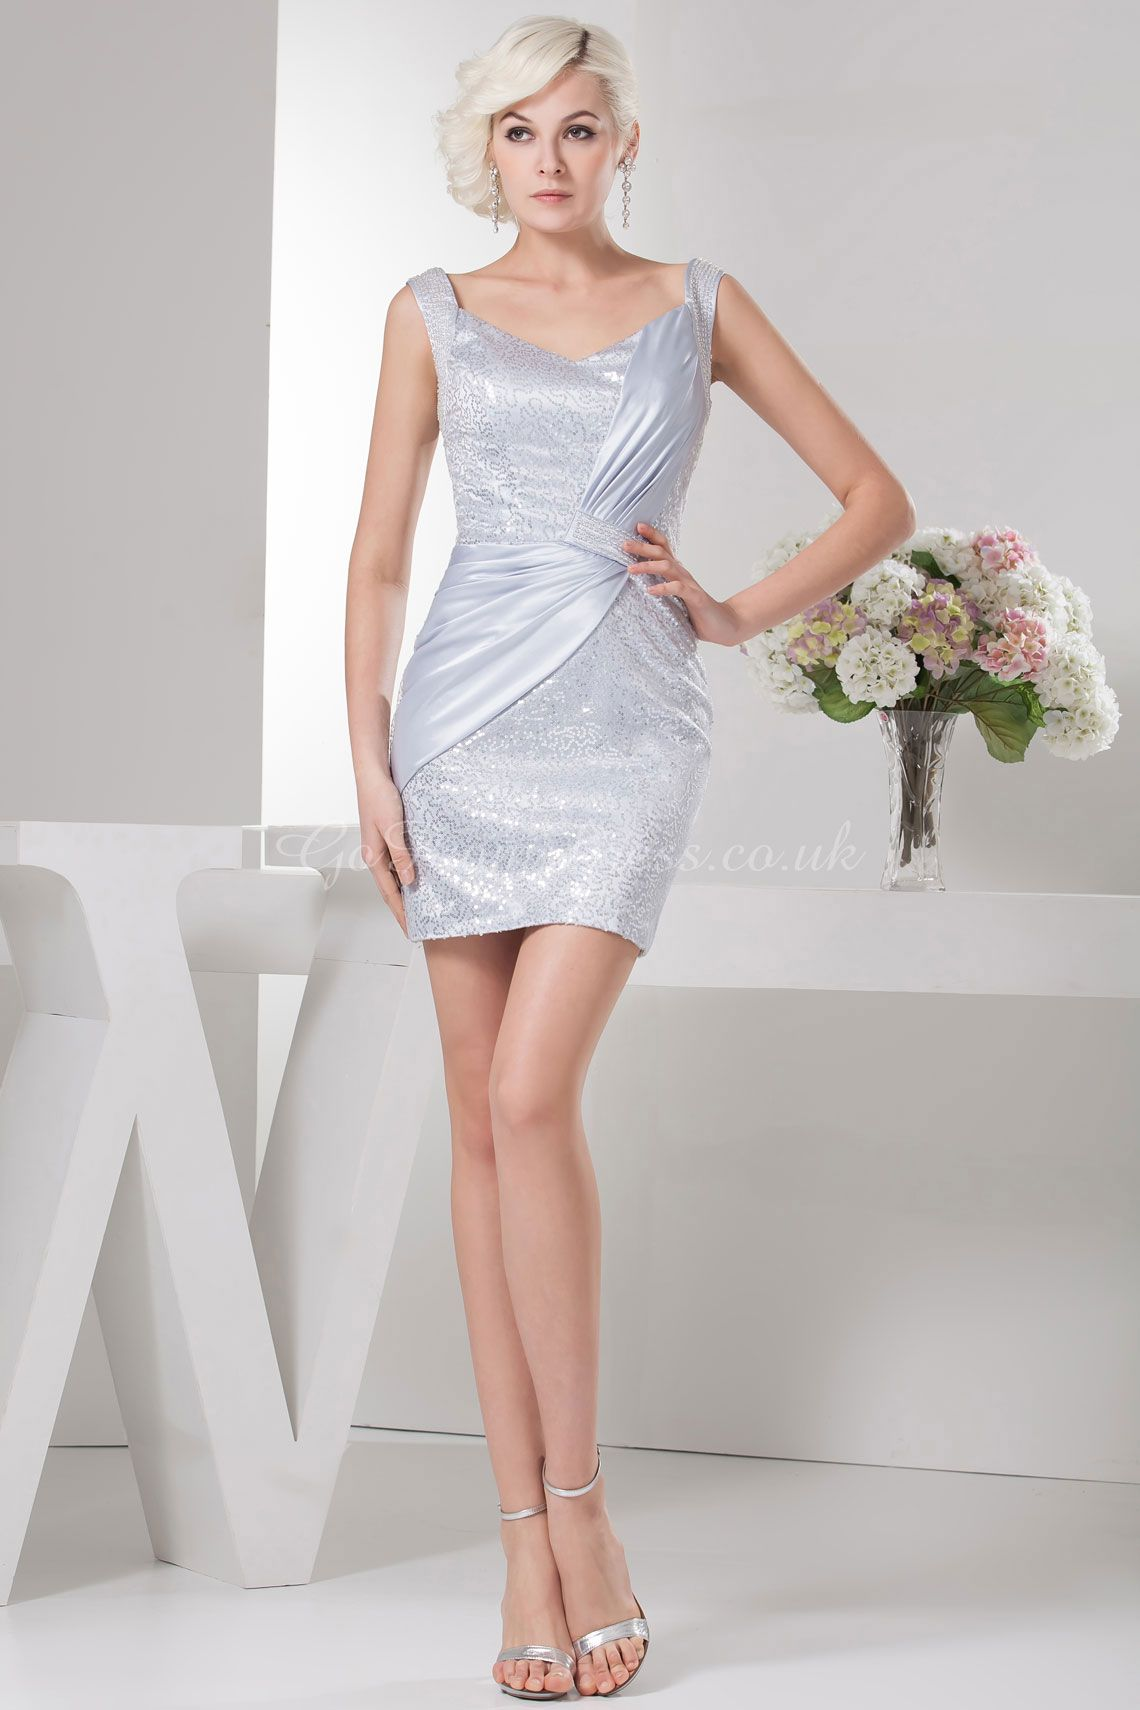 Prom dressescocktail dress legheel pinterest prom mothers